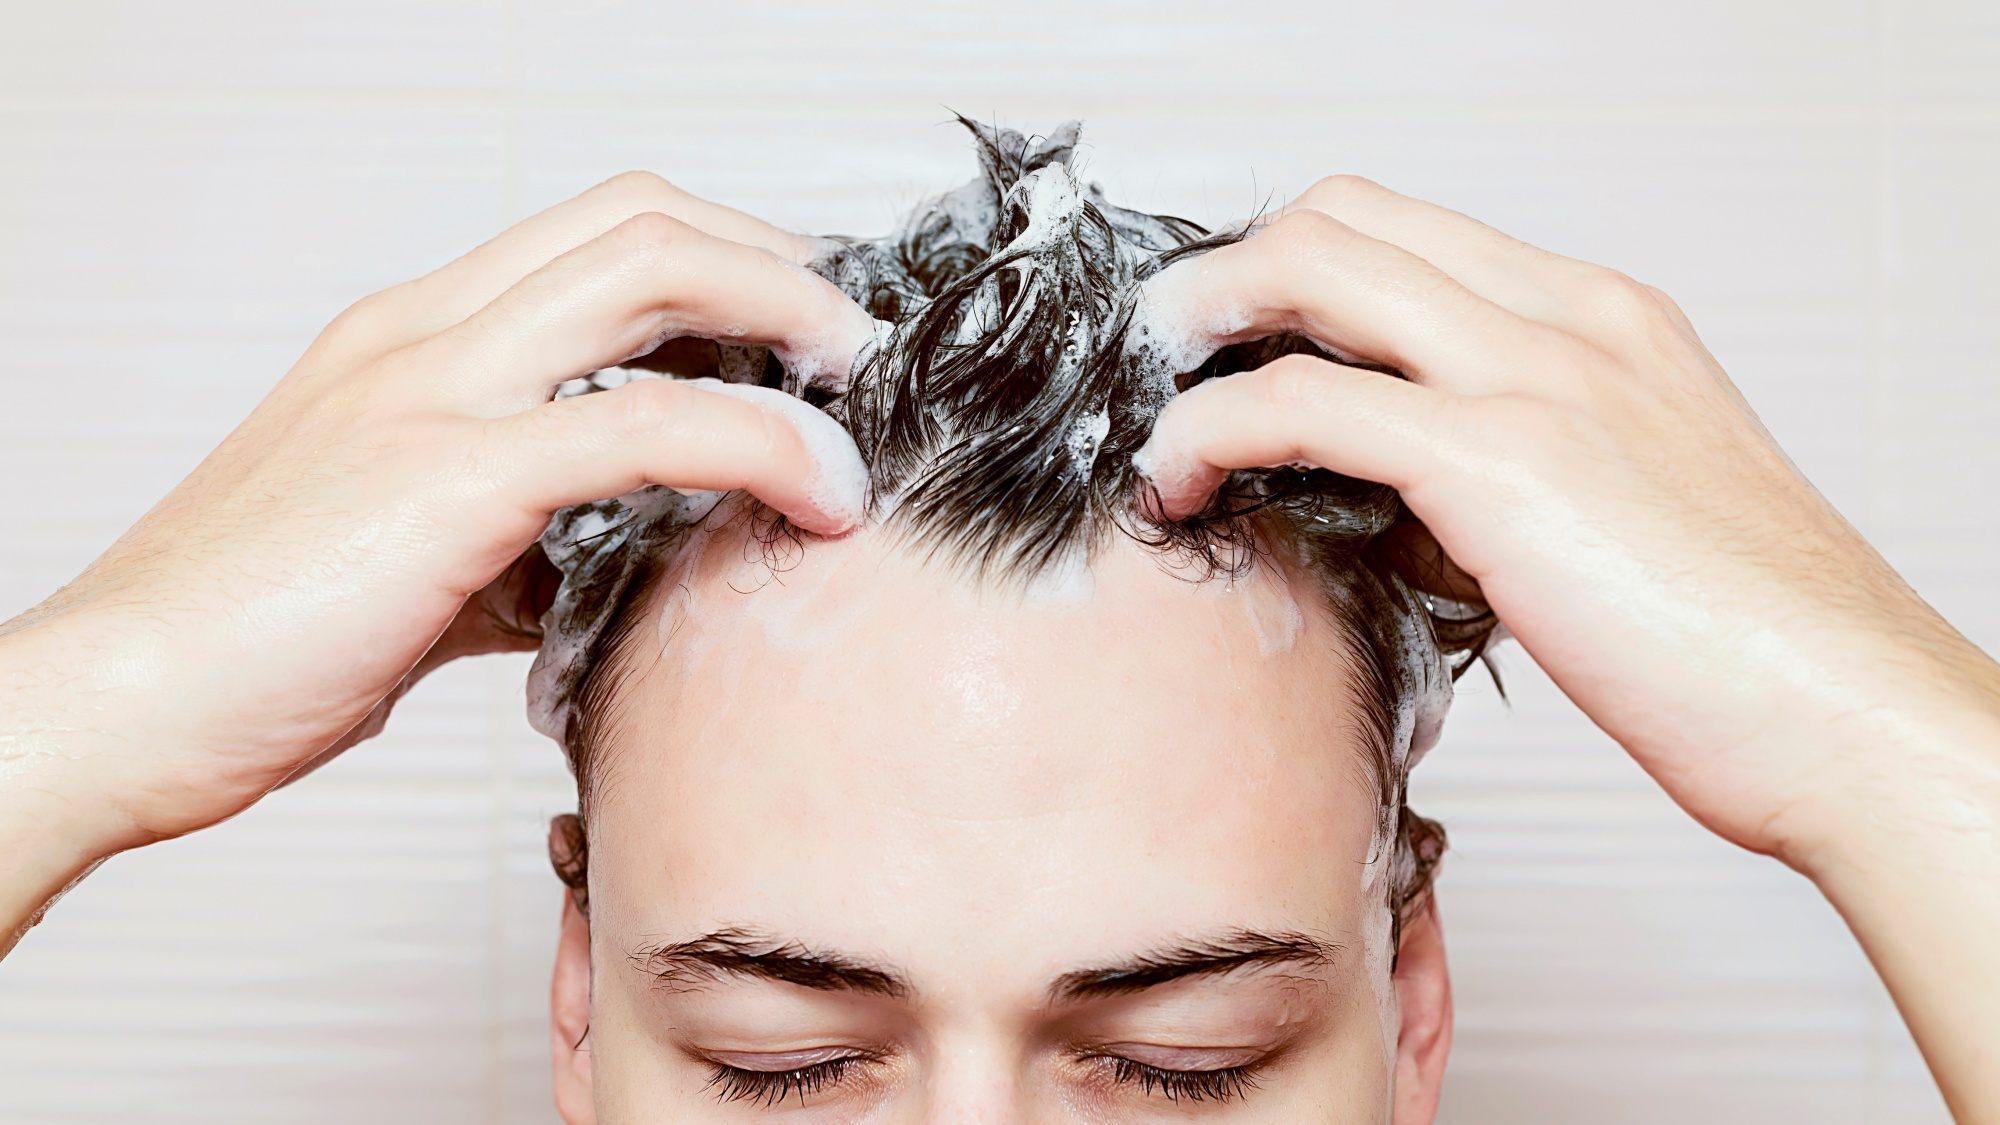 Limp hair men: a man washing his hair